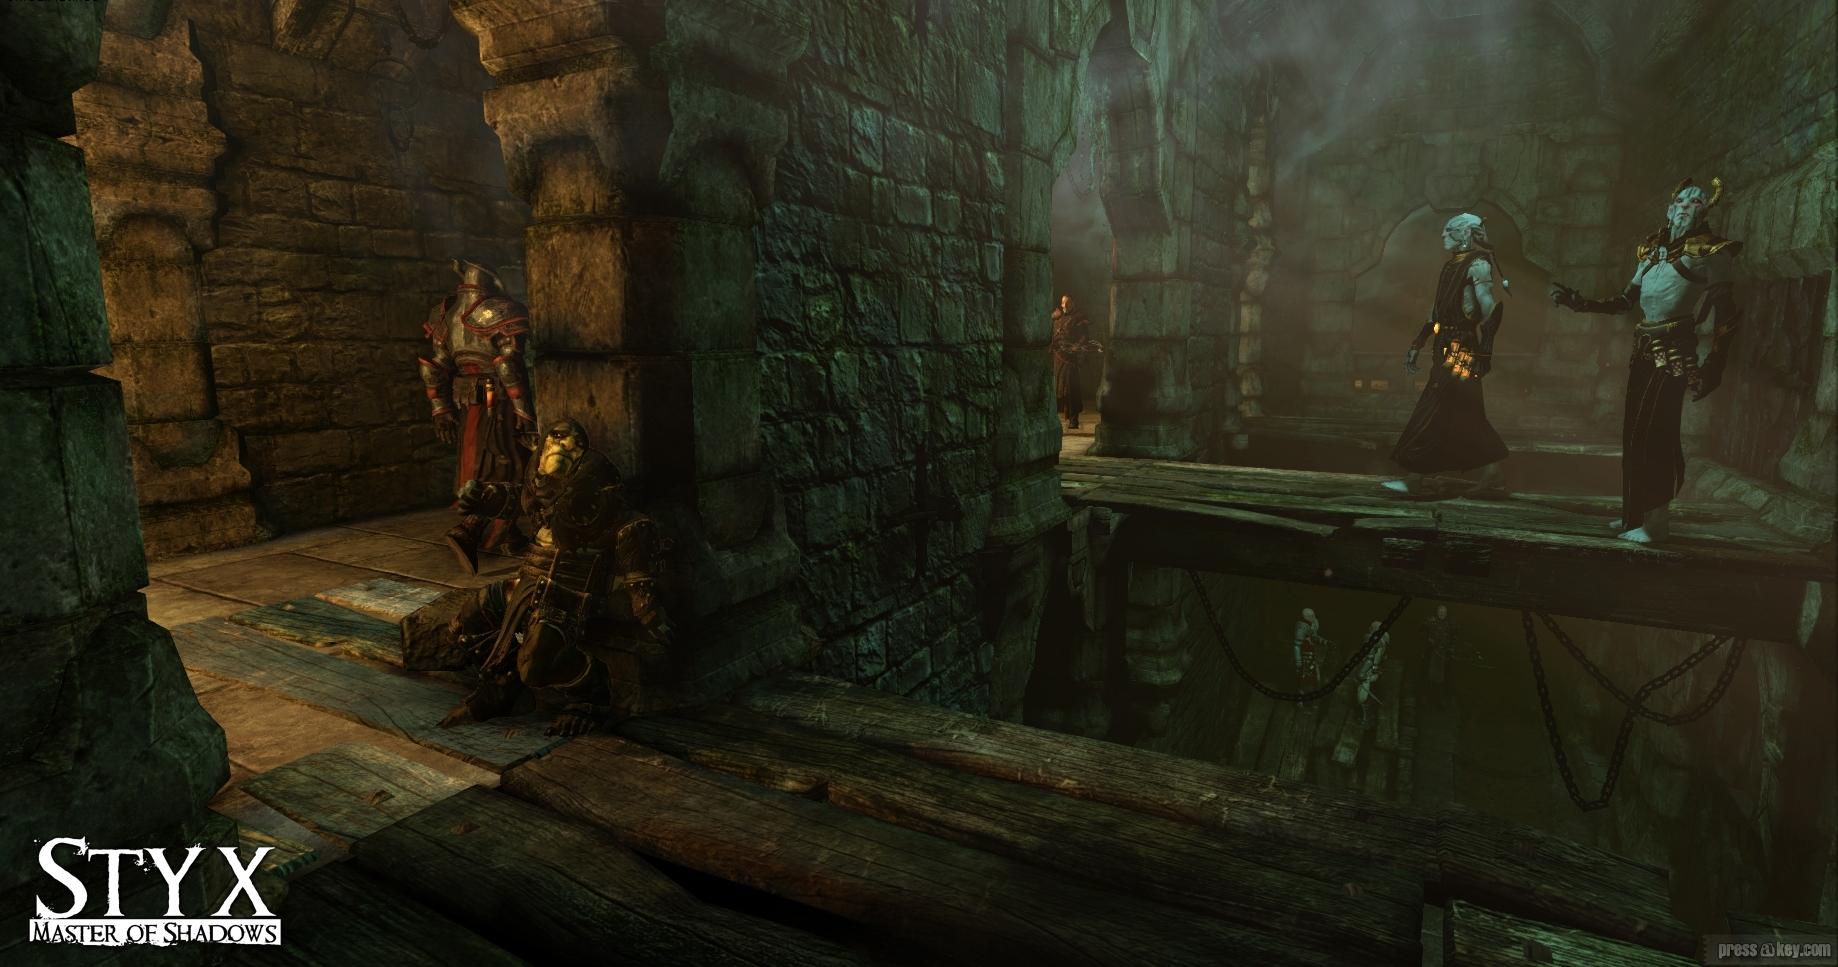 Styx Master of Shadows   Screenshot Galerie pressakeycom 1838x967